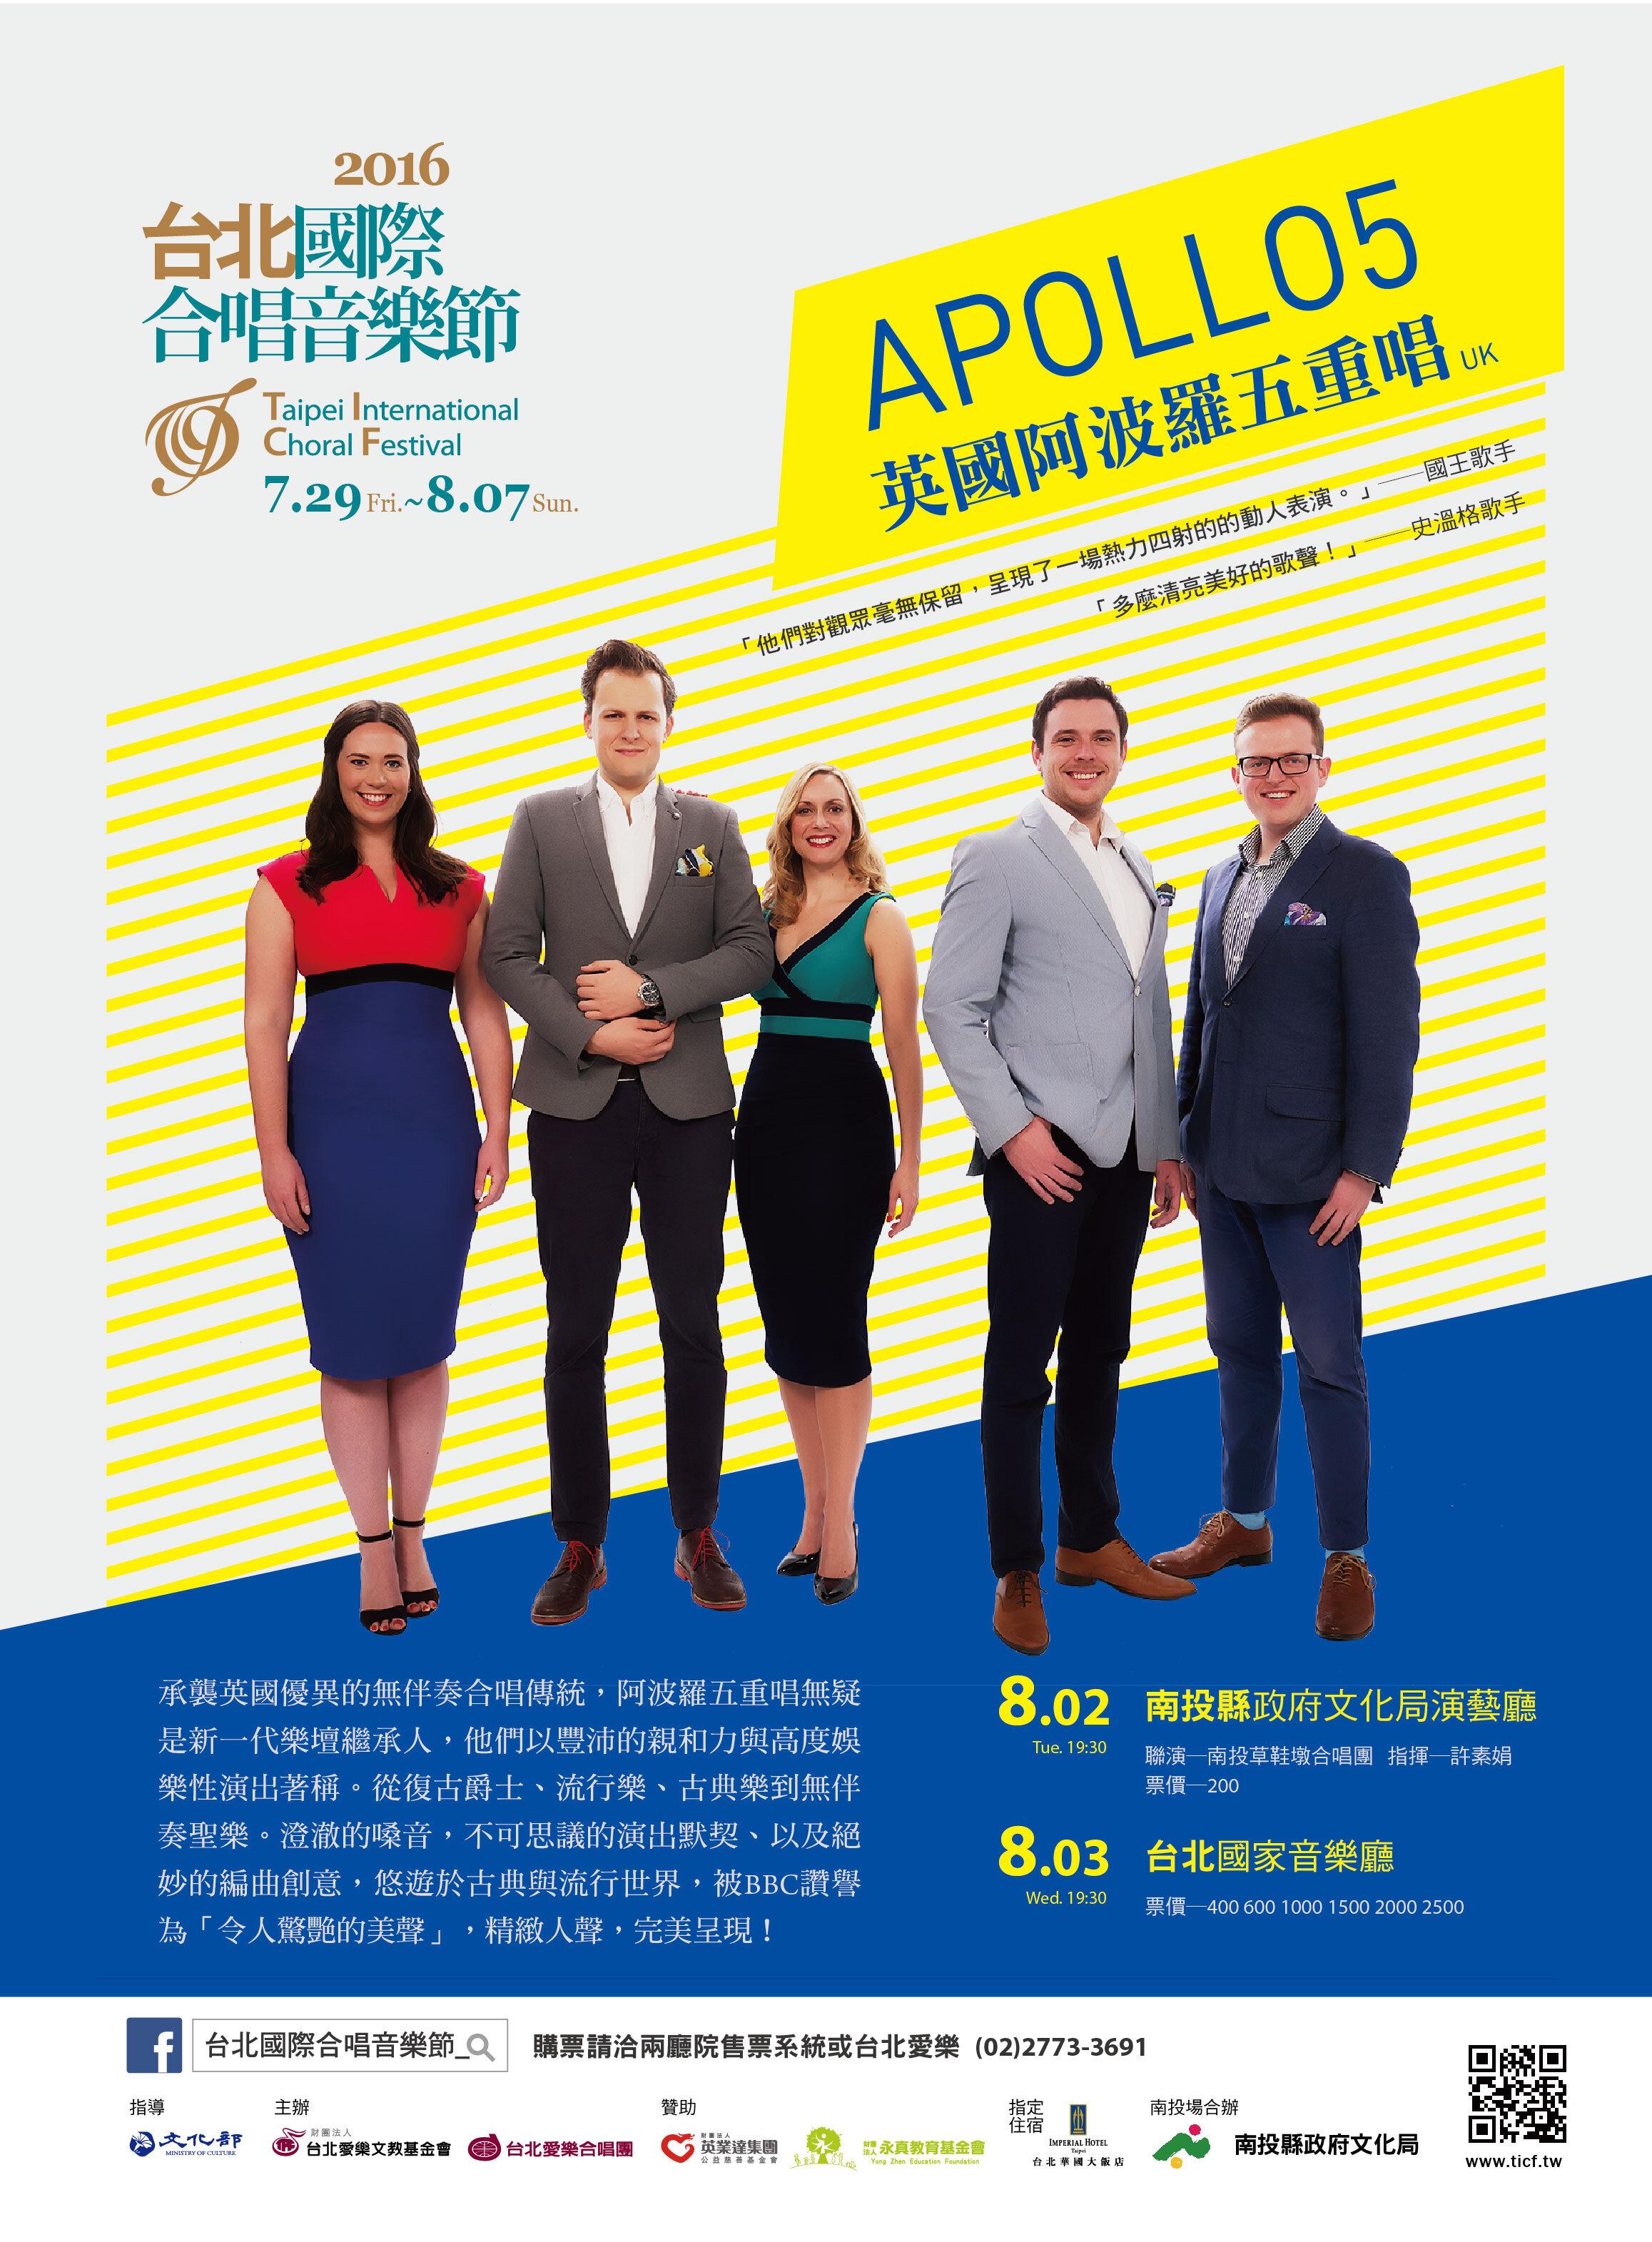 TICF16 歷史回顧 ARCHIVE — 臺北國際合唱音樂節 Taipei International Choral Festival